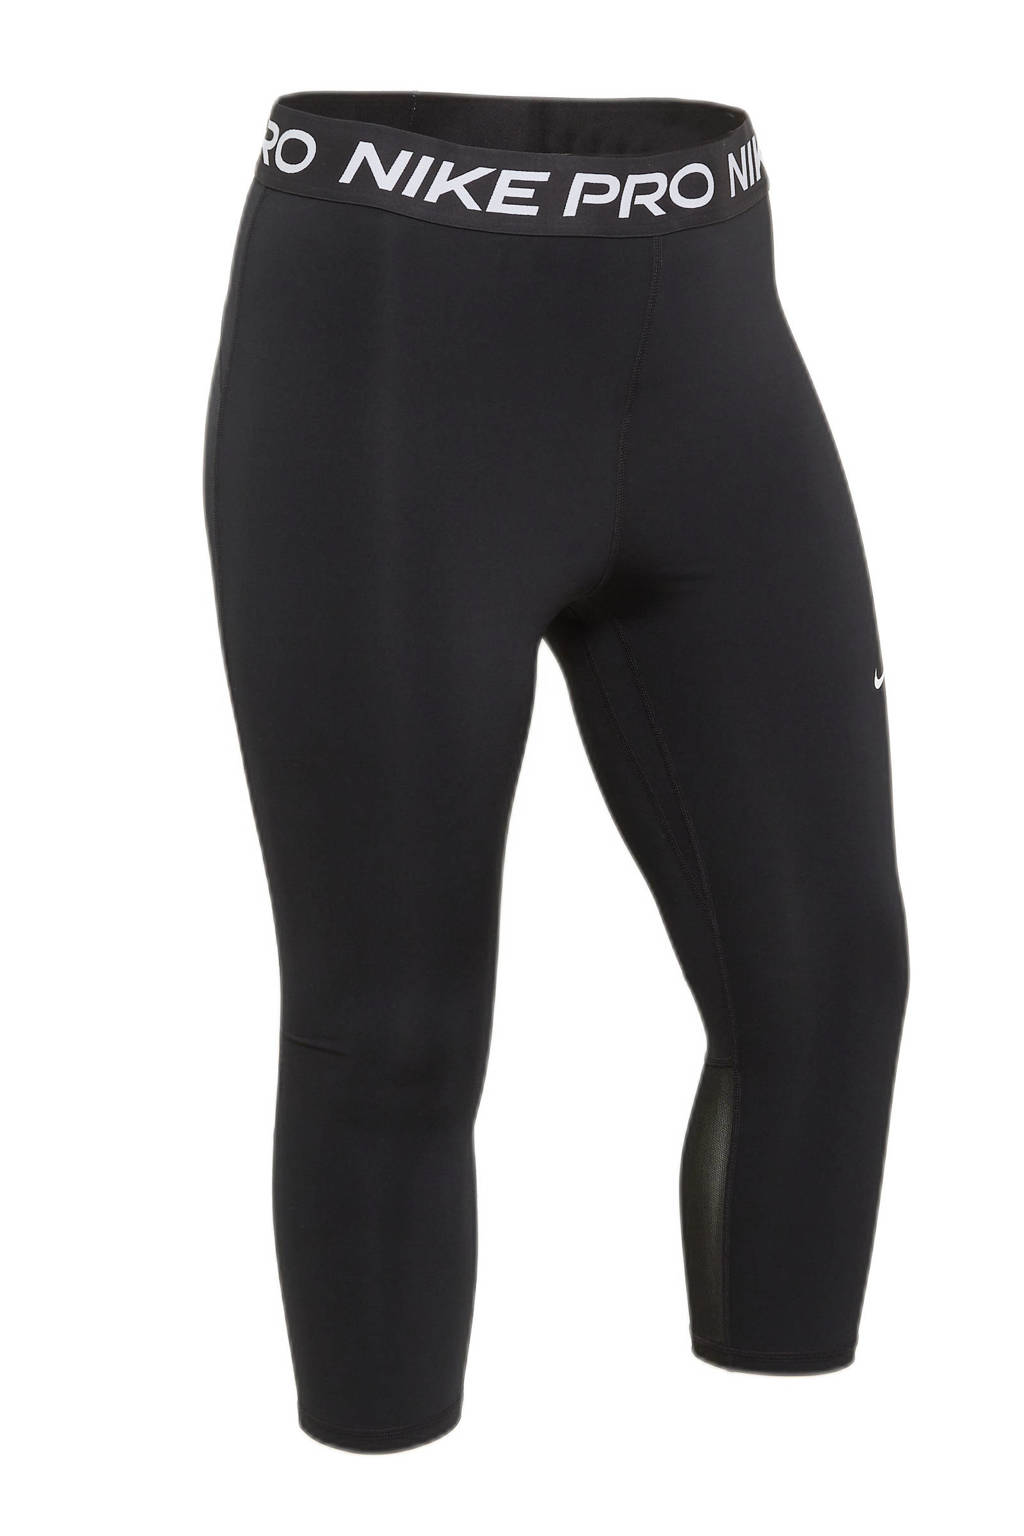 Nike Plus Size 7/8 sportbroek zwart/wit, Zwart/wit